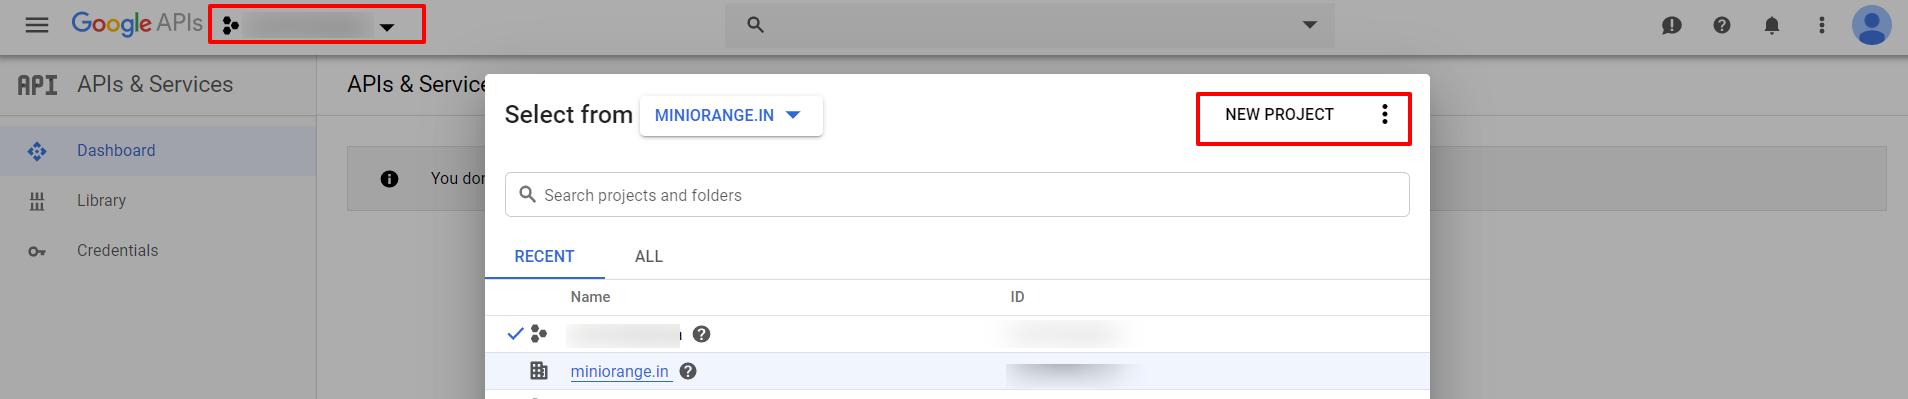 Rest API OAuth, API token, API Key authentication for Jira and Confluence Google Apps